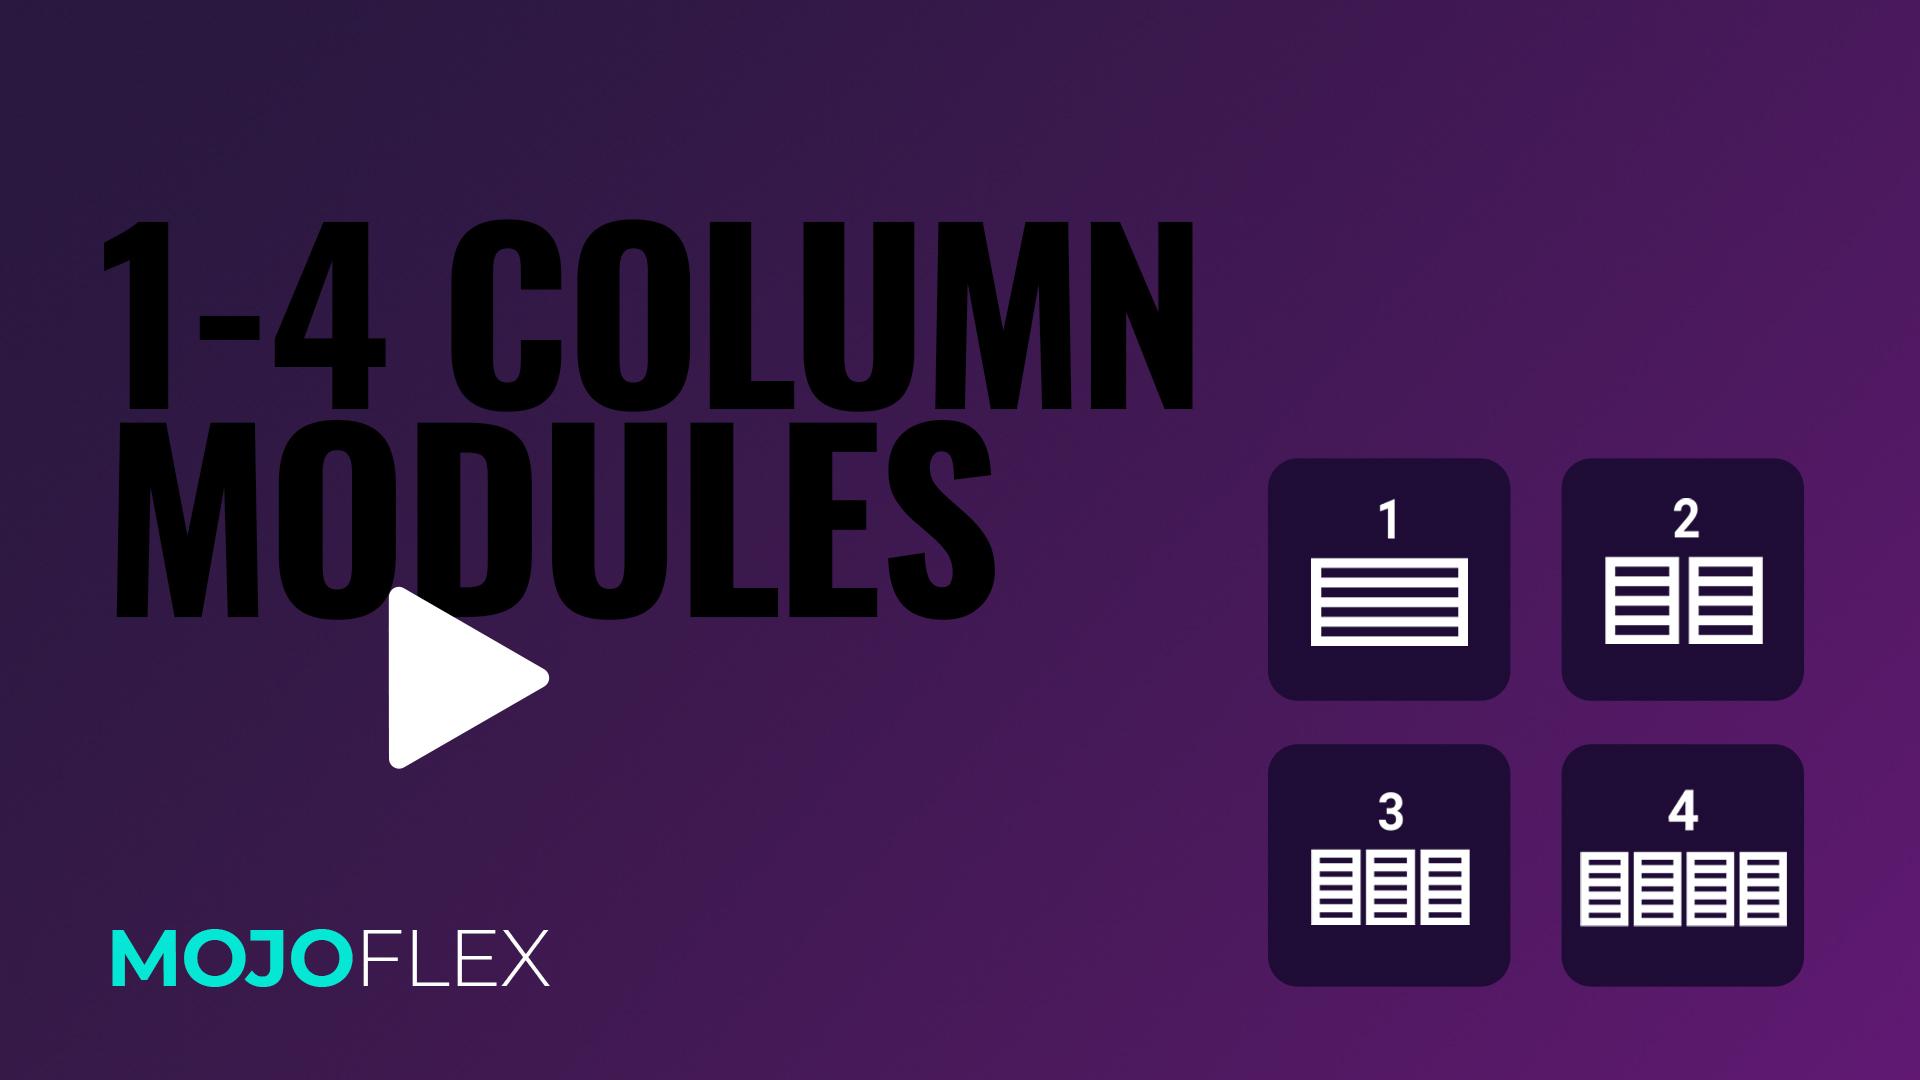 1-4-column